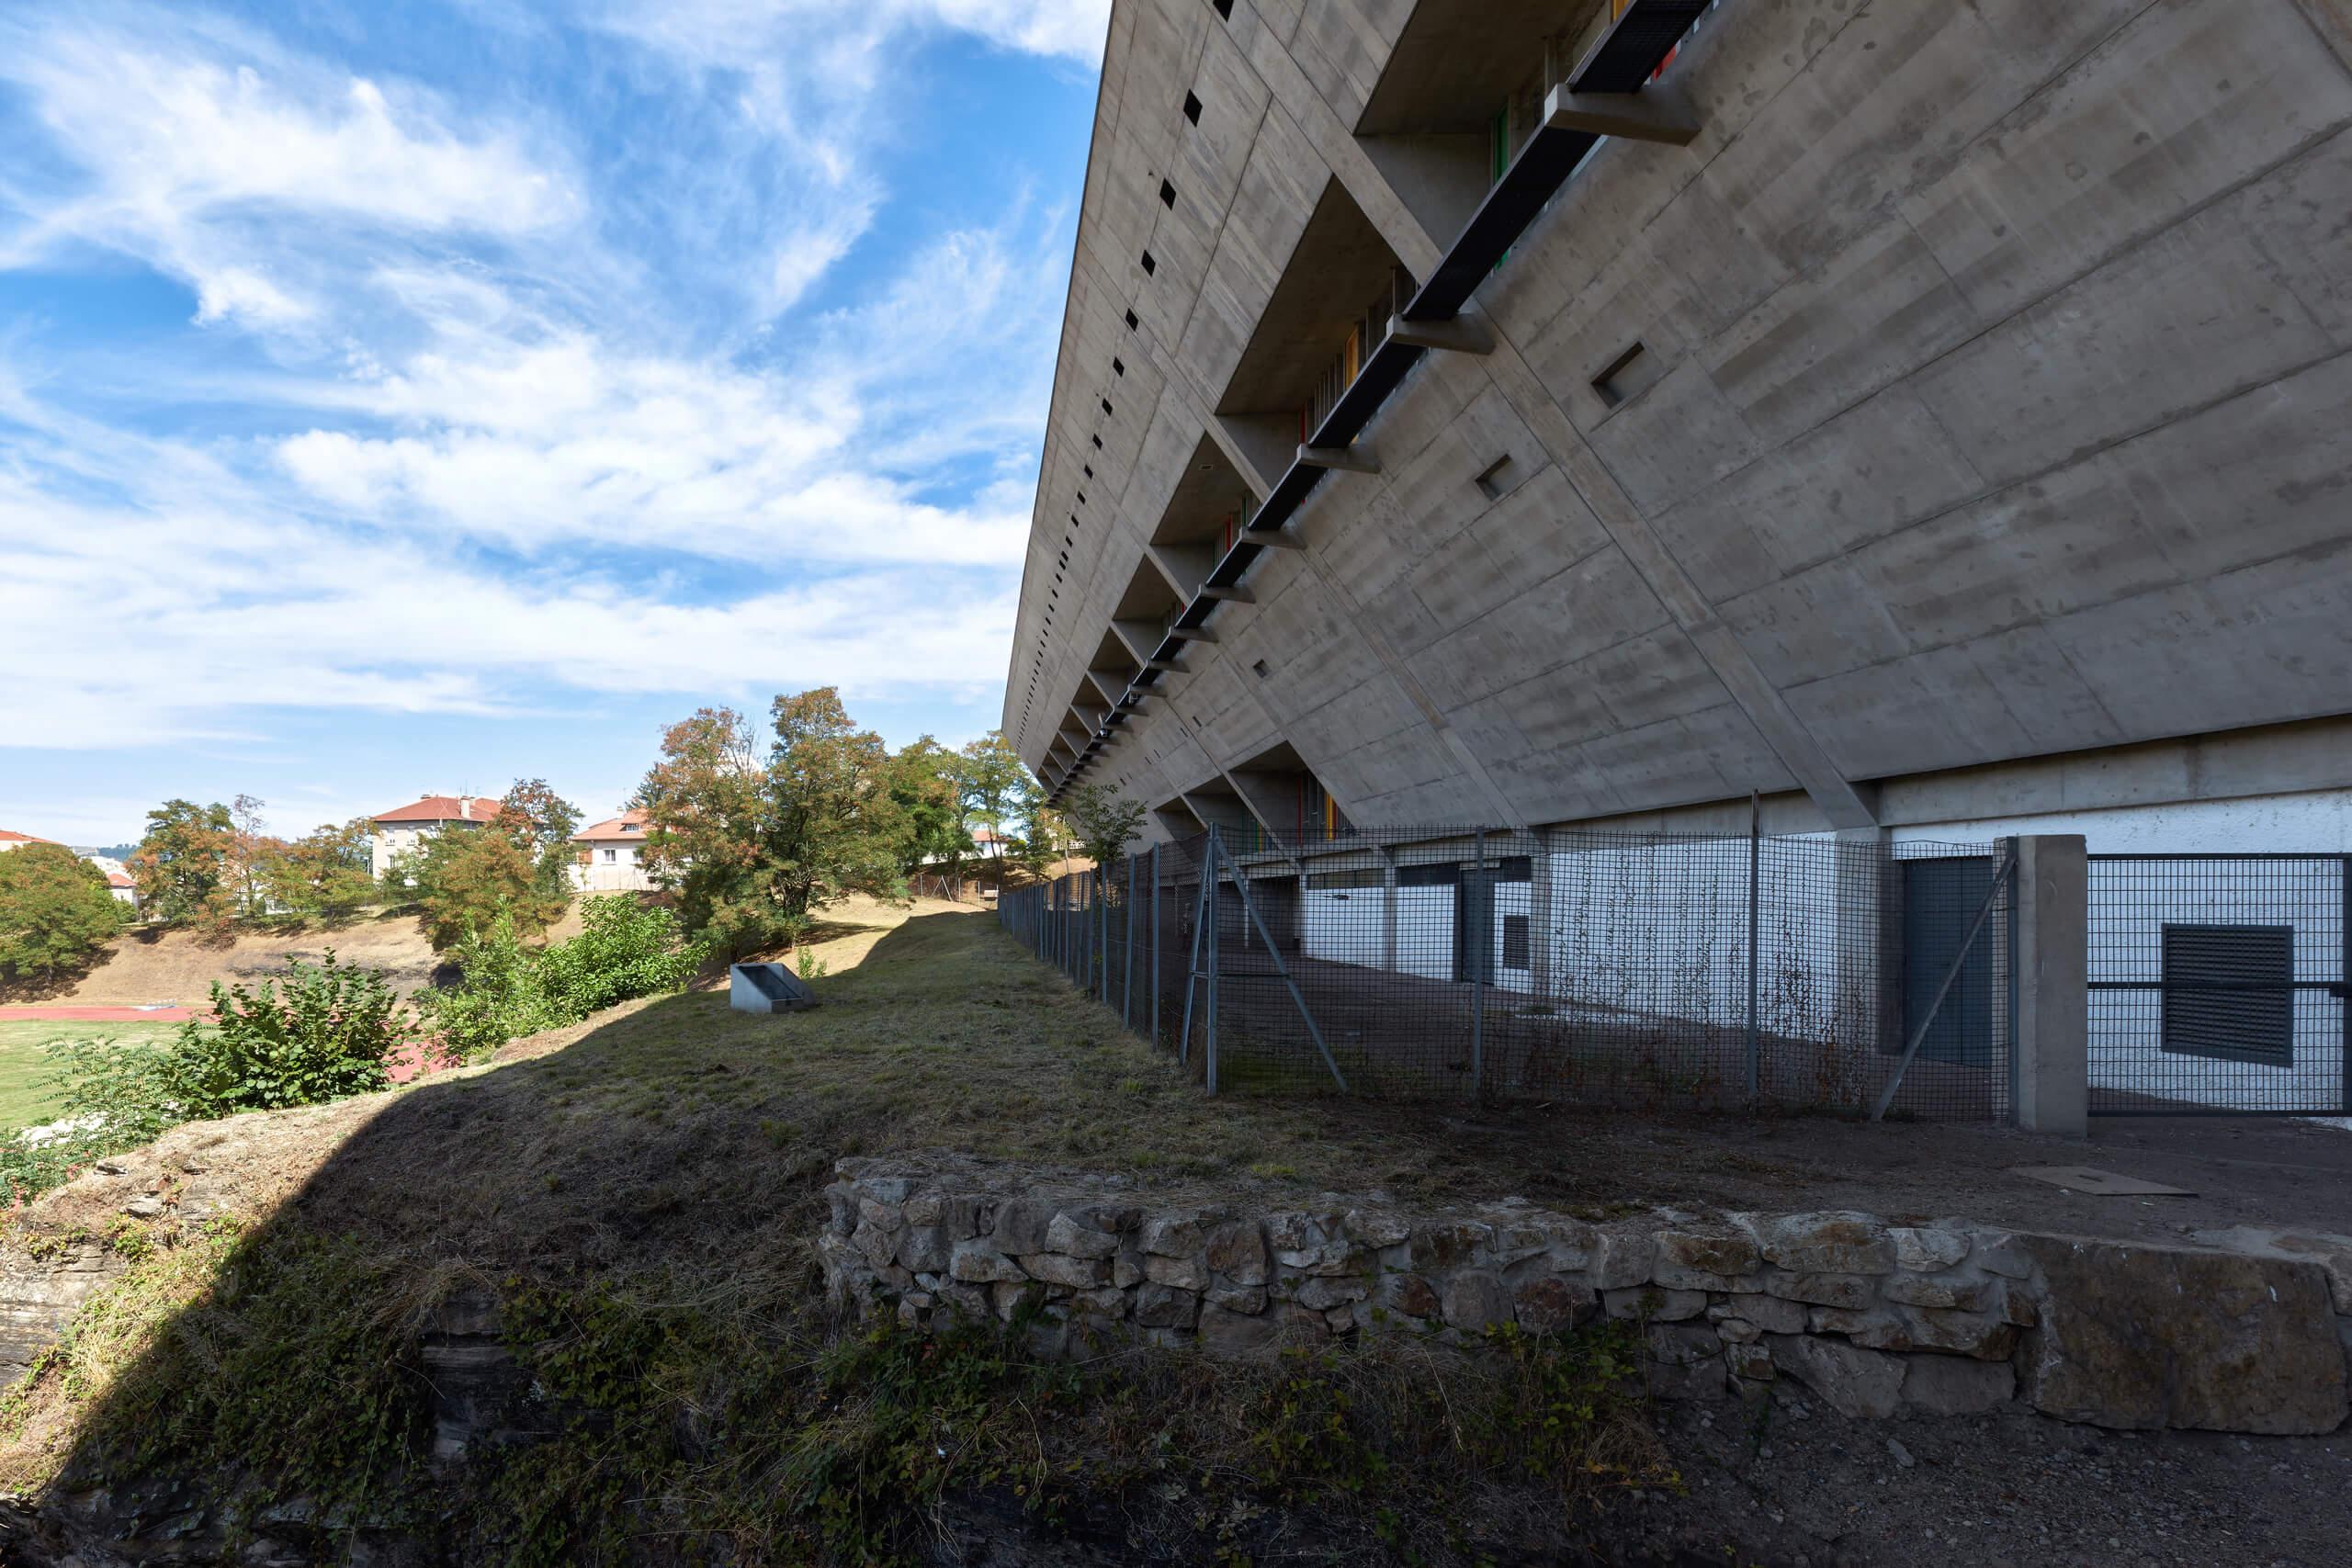 Federico_Covre_Le_Corbusier_Stadium_Firminy_2018_23